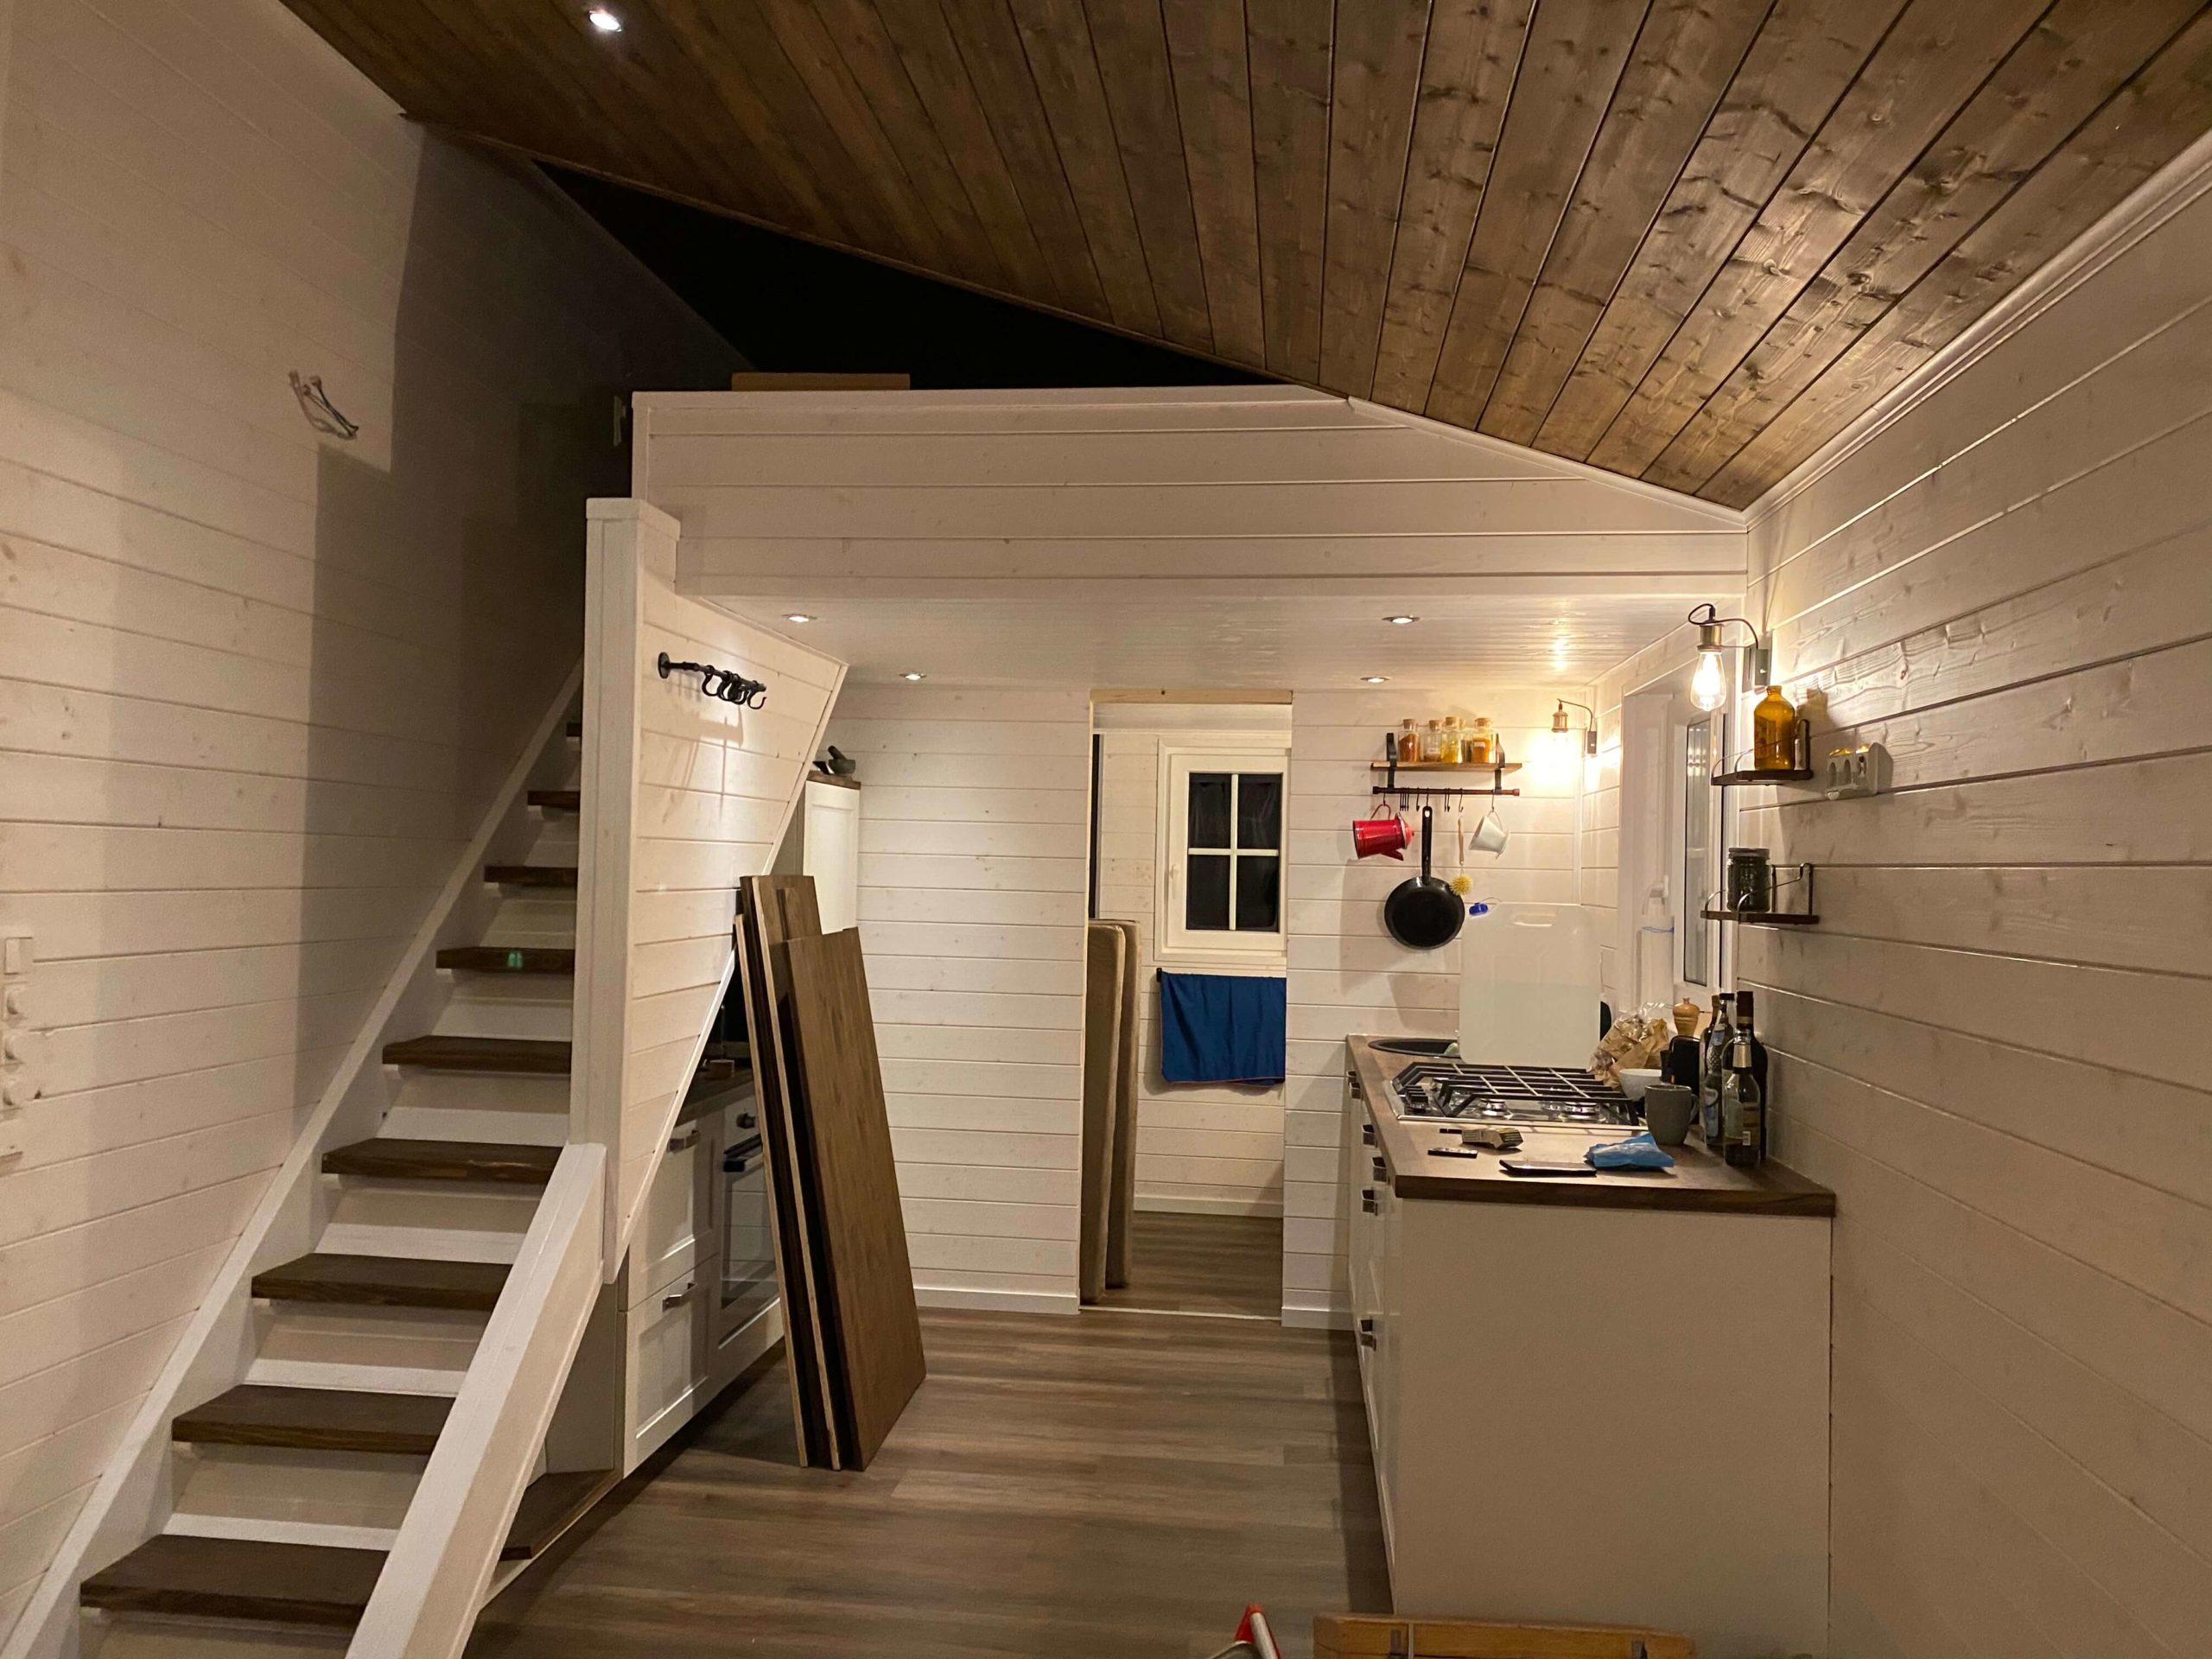 mobiles-tiny-house-lappland-vital-camp-gmbh-27